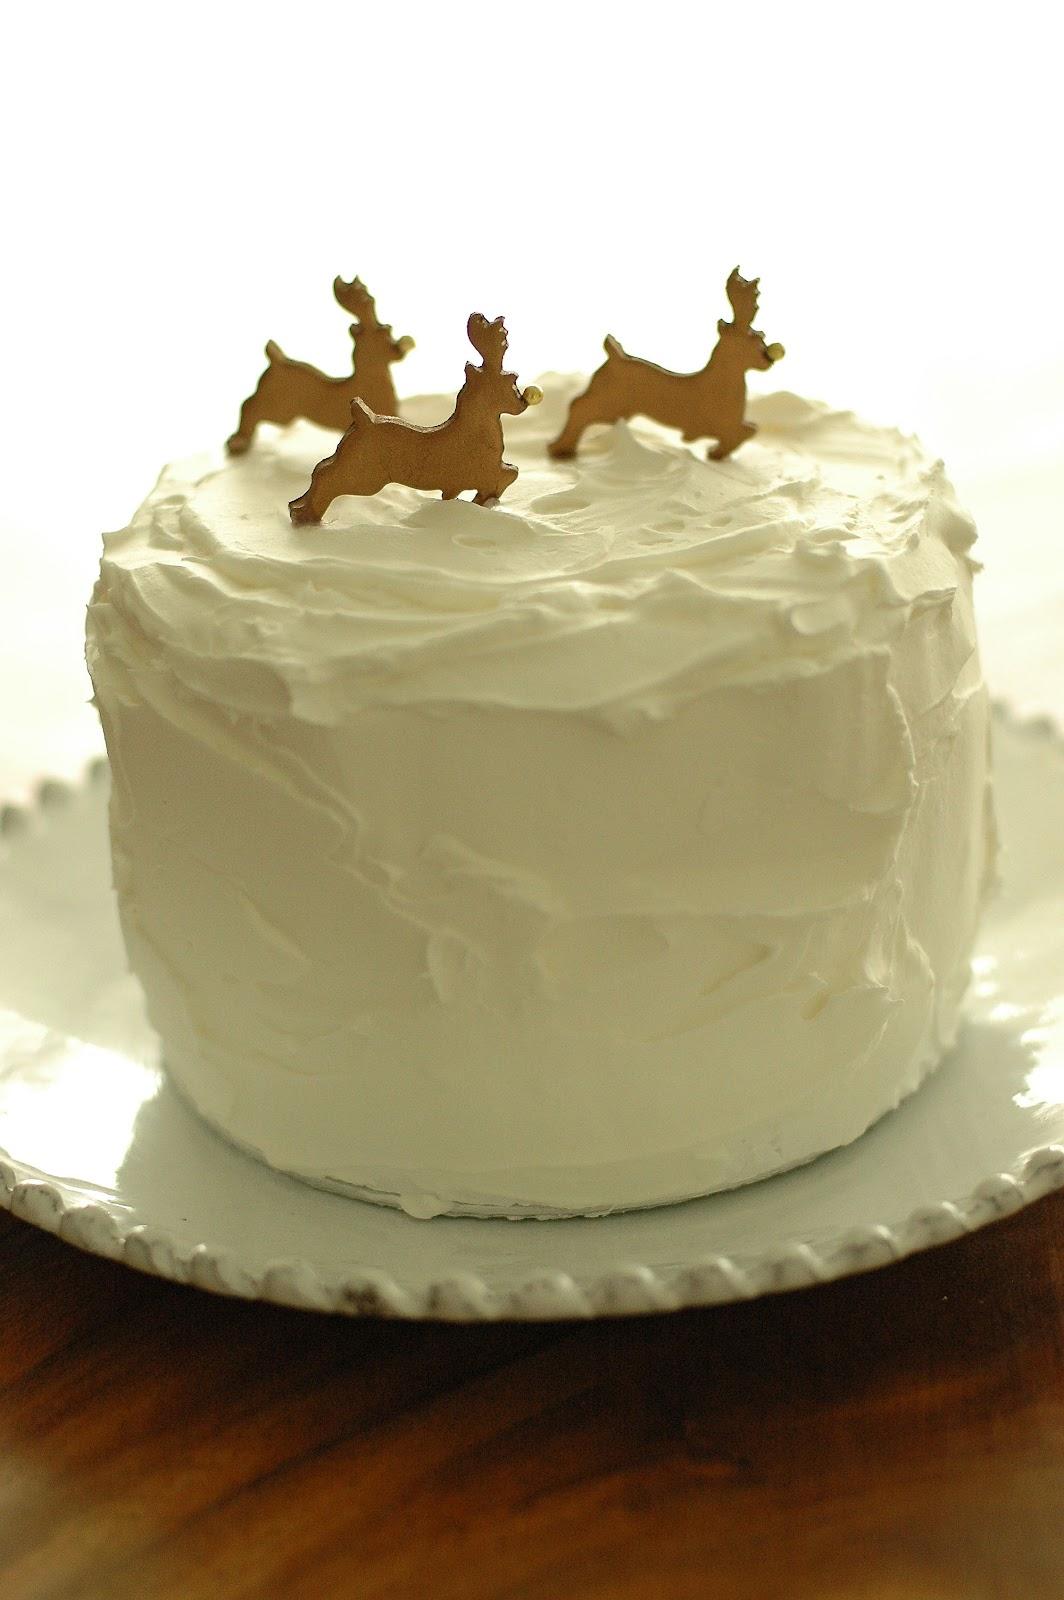 Kuidaore Fabulous Holiday Desserts 27 Amp 28 October 2012